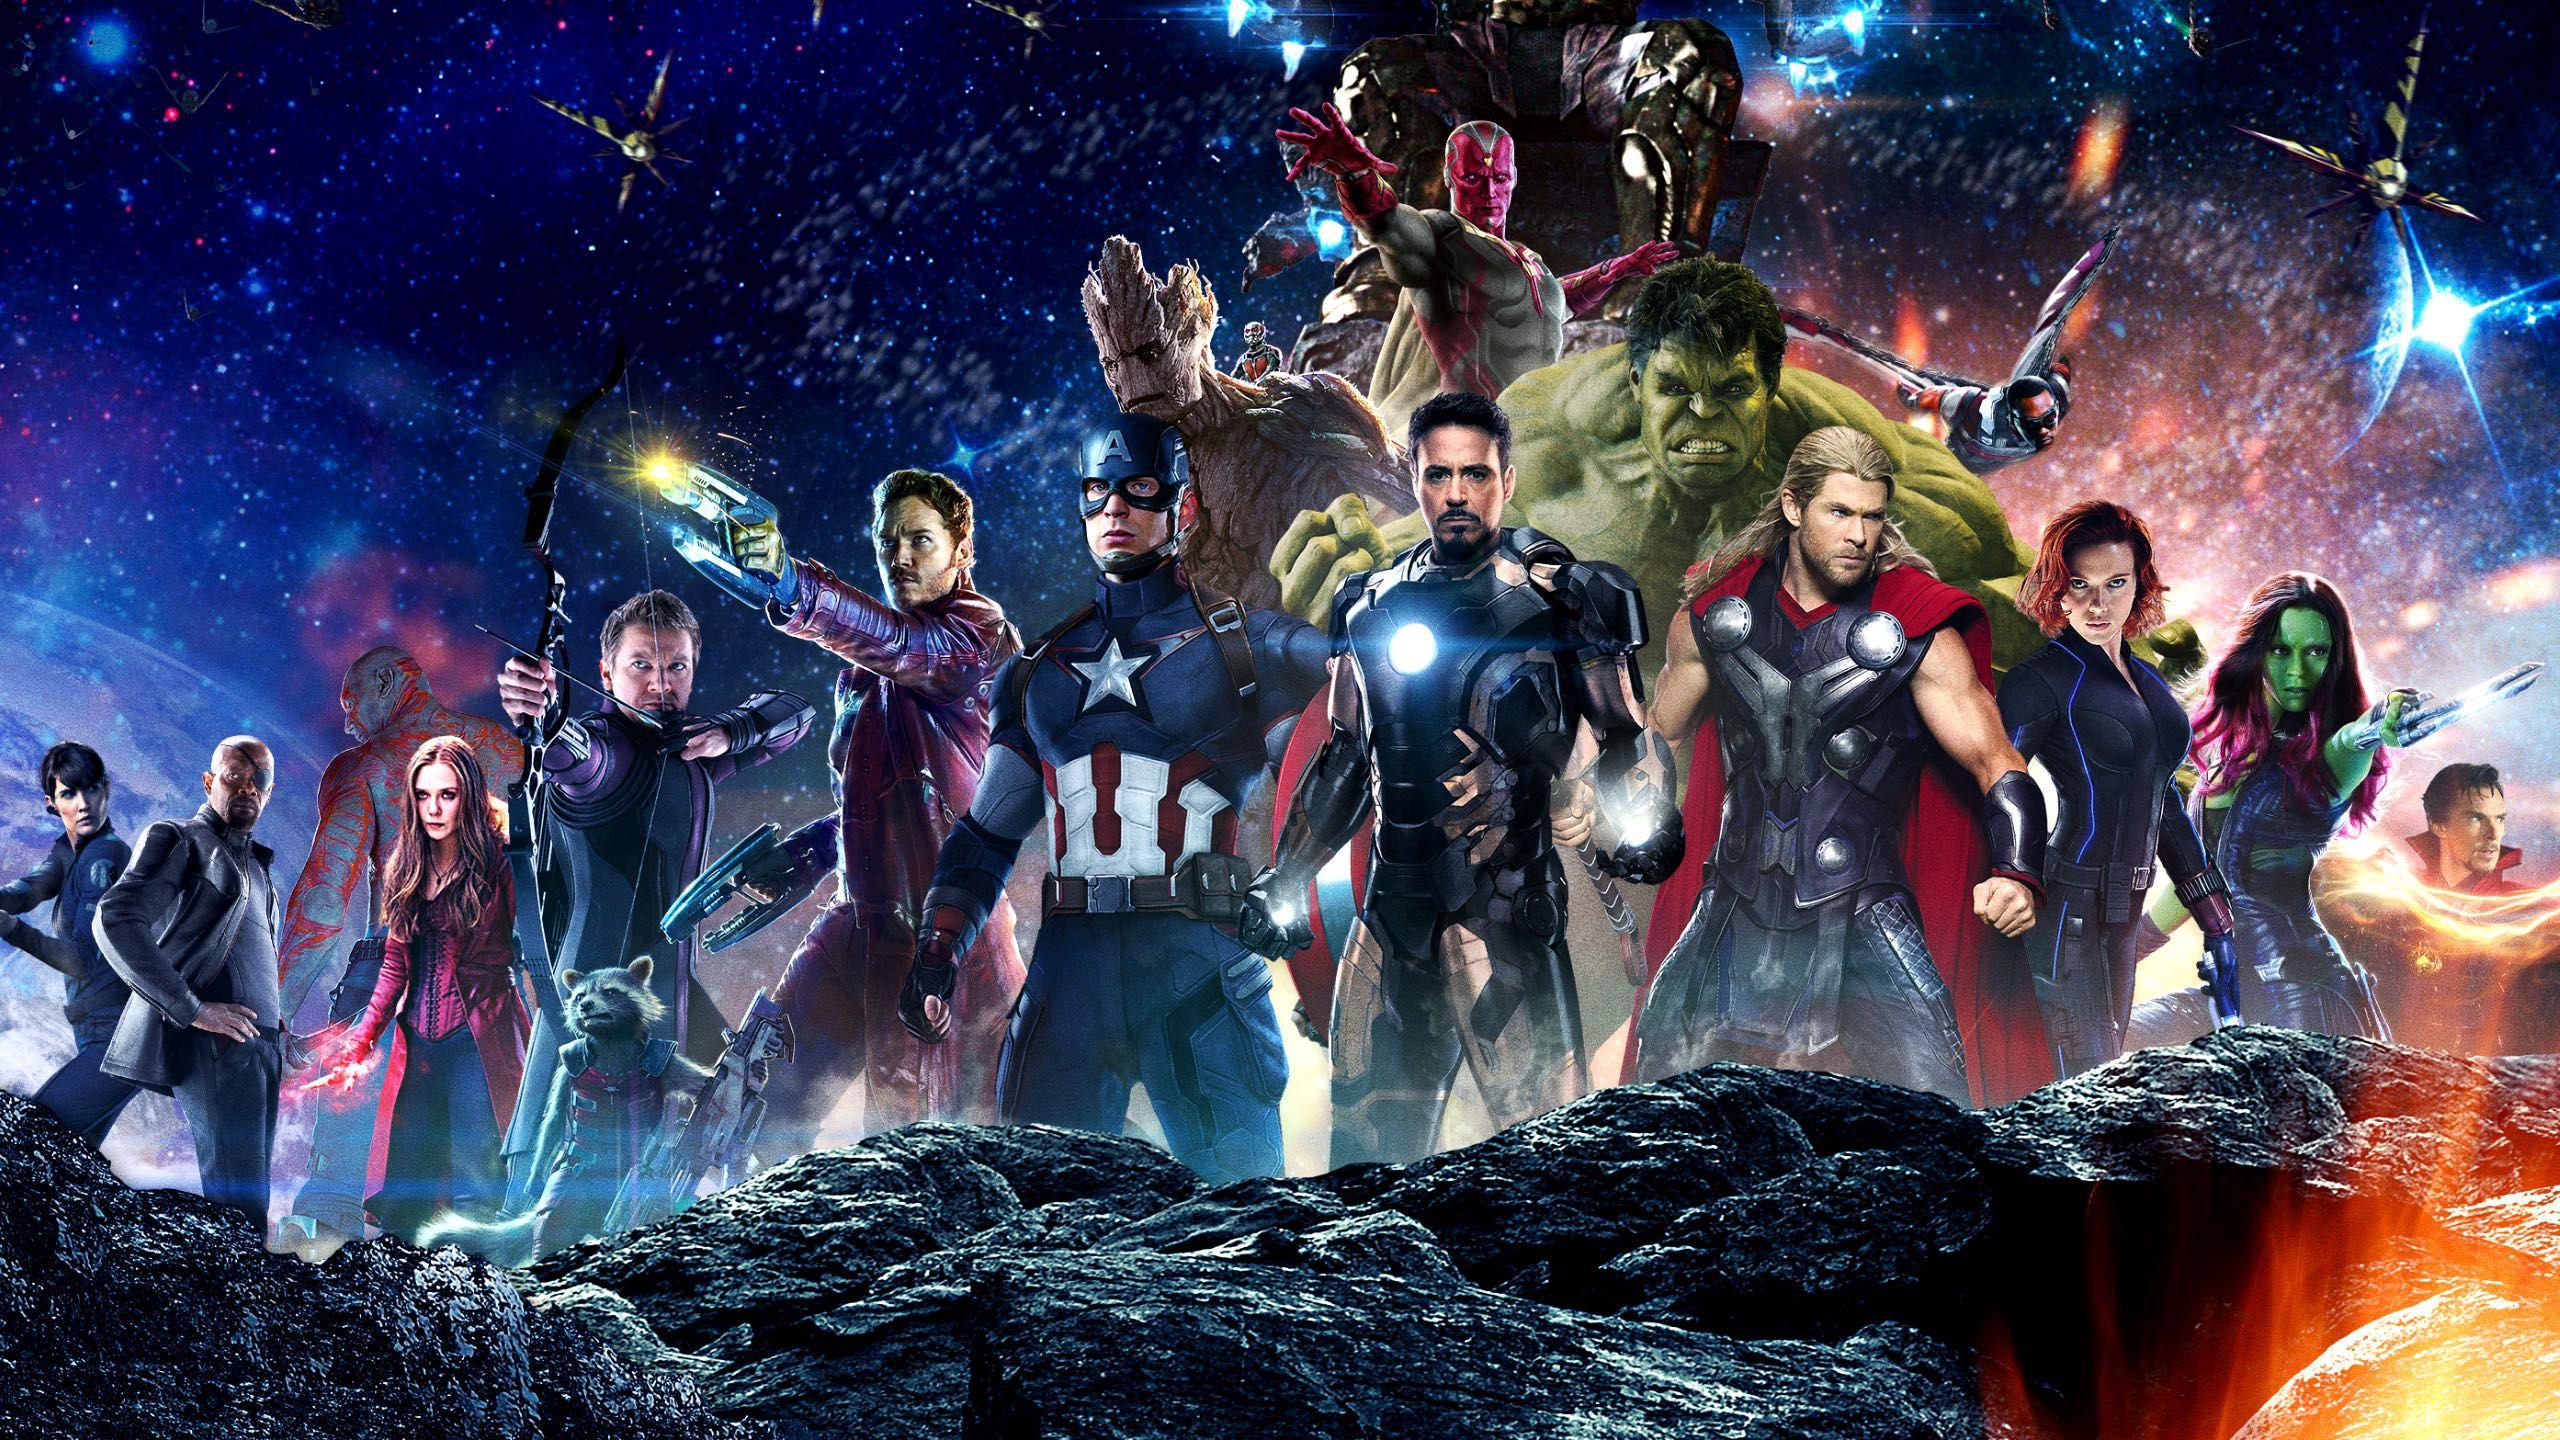 Da Infinity War A Deadpool 2 Ecco Tutti I Cinecomic In Uscita Nel 2018